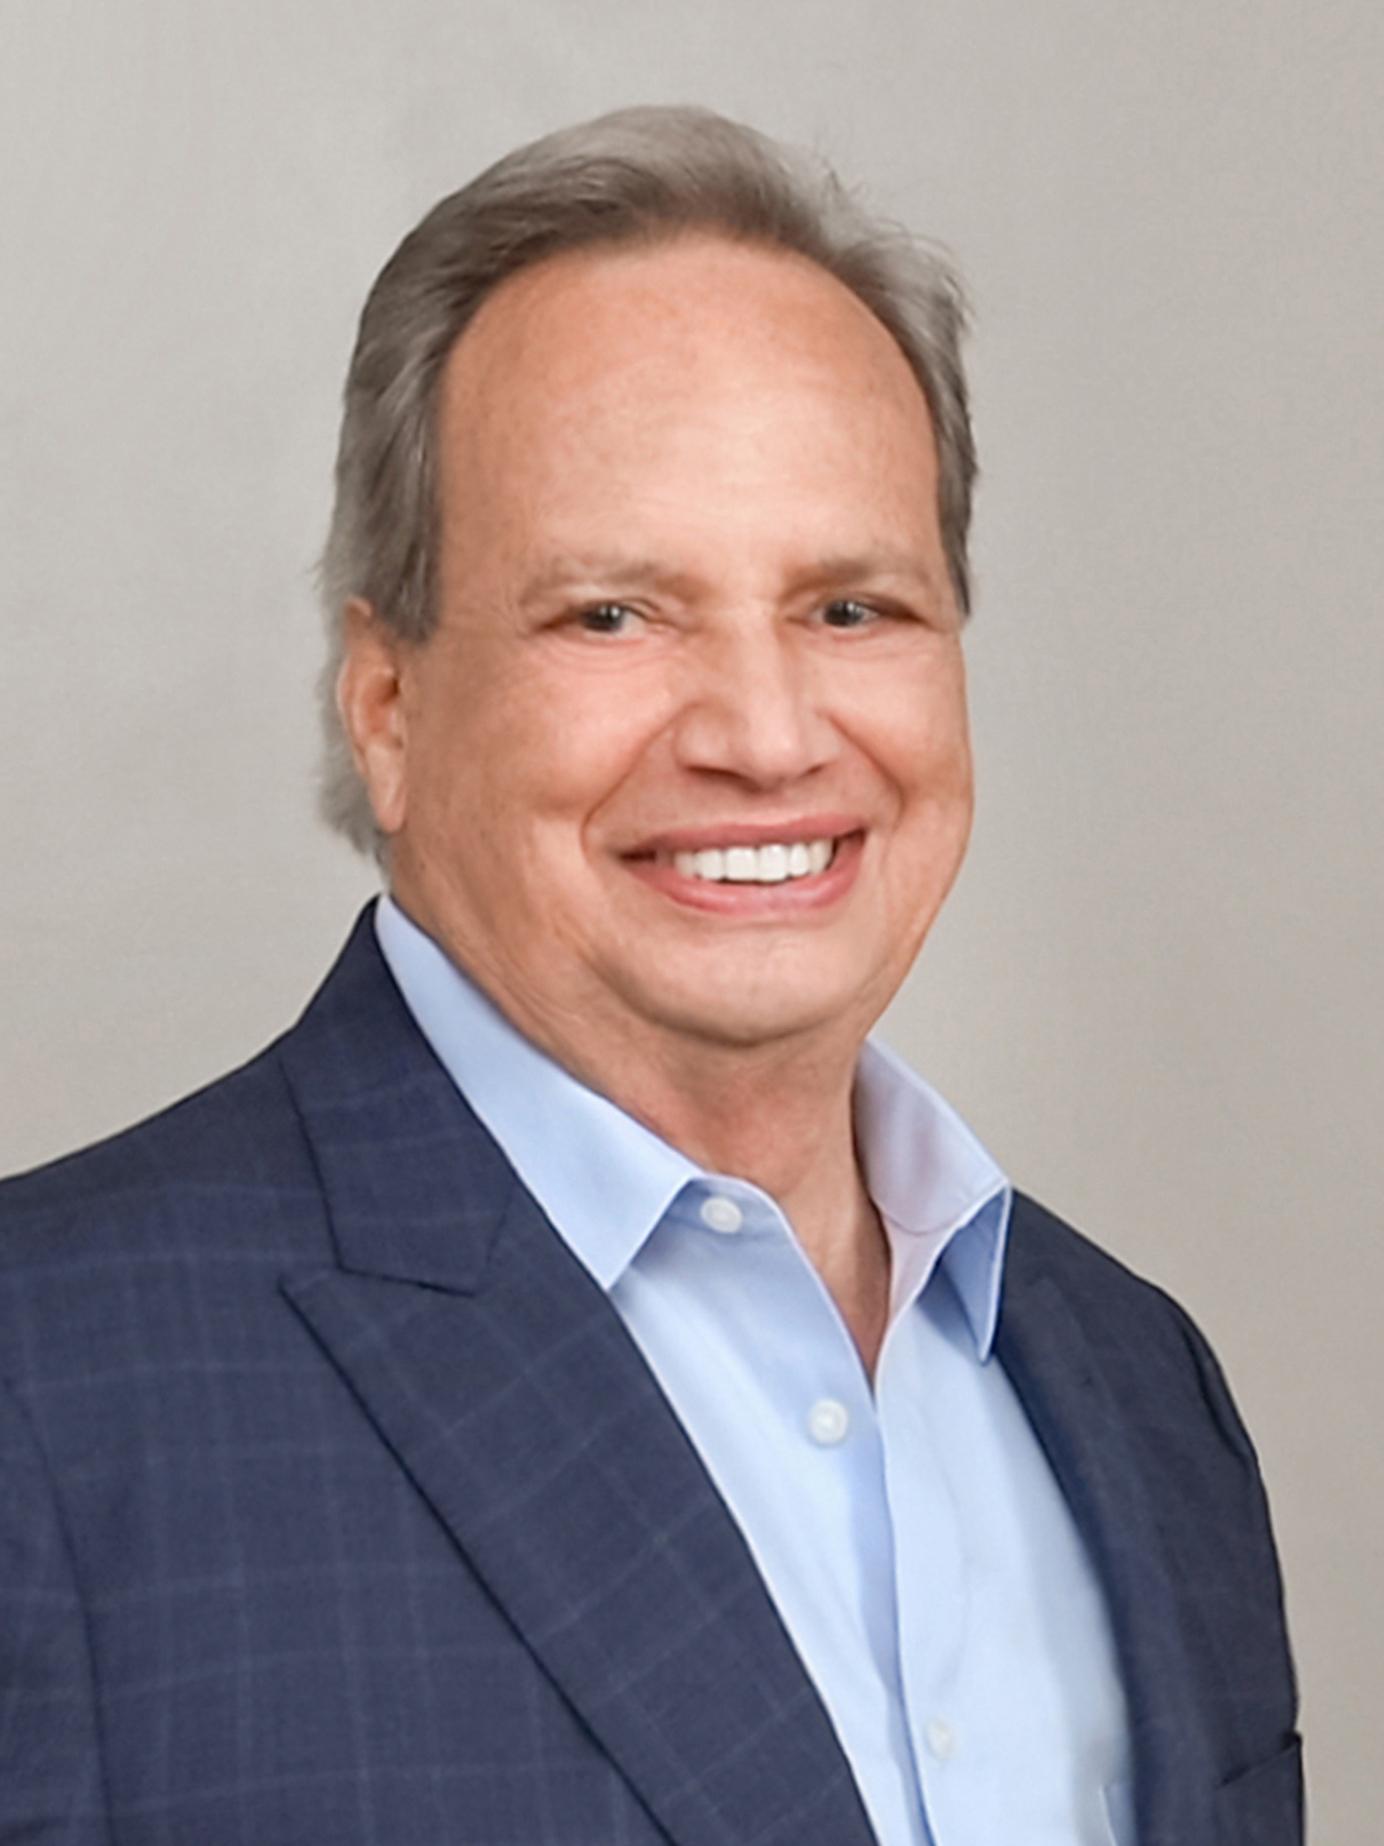 Peter G Laughlin